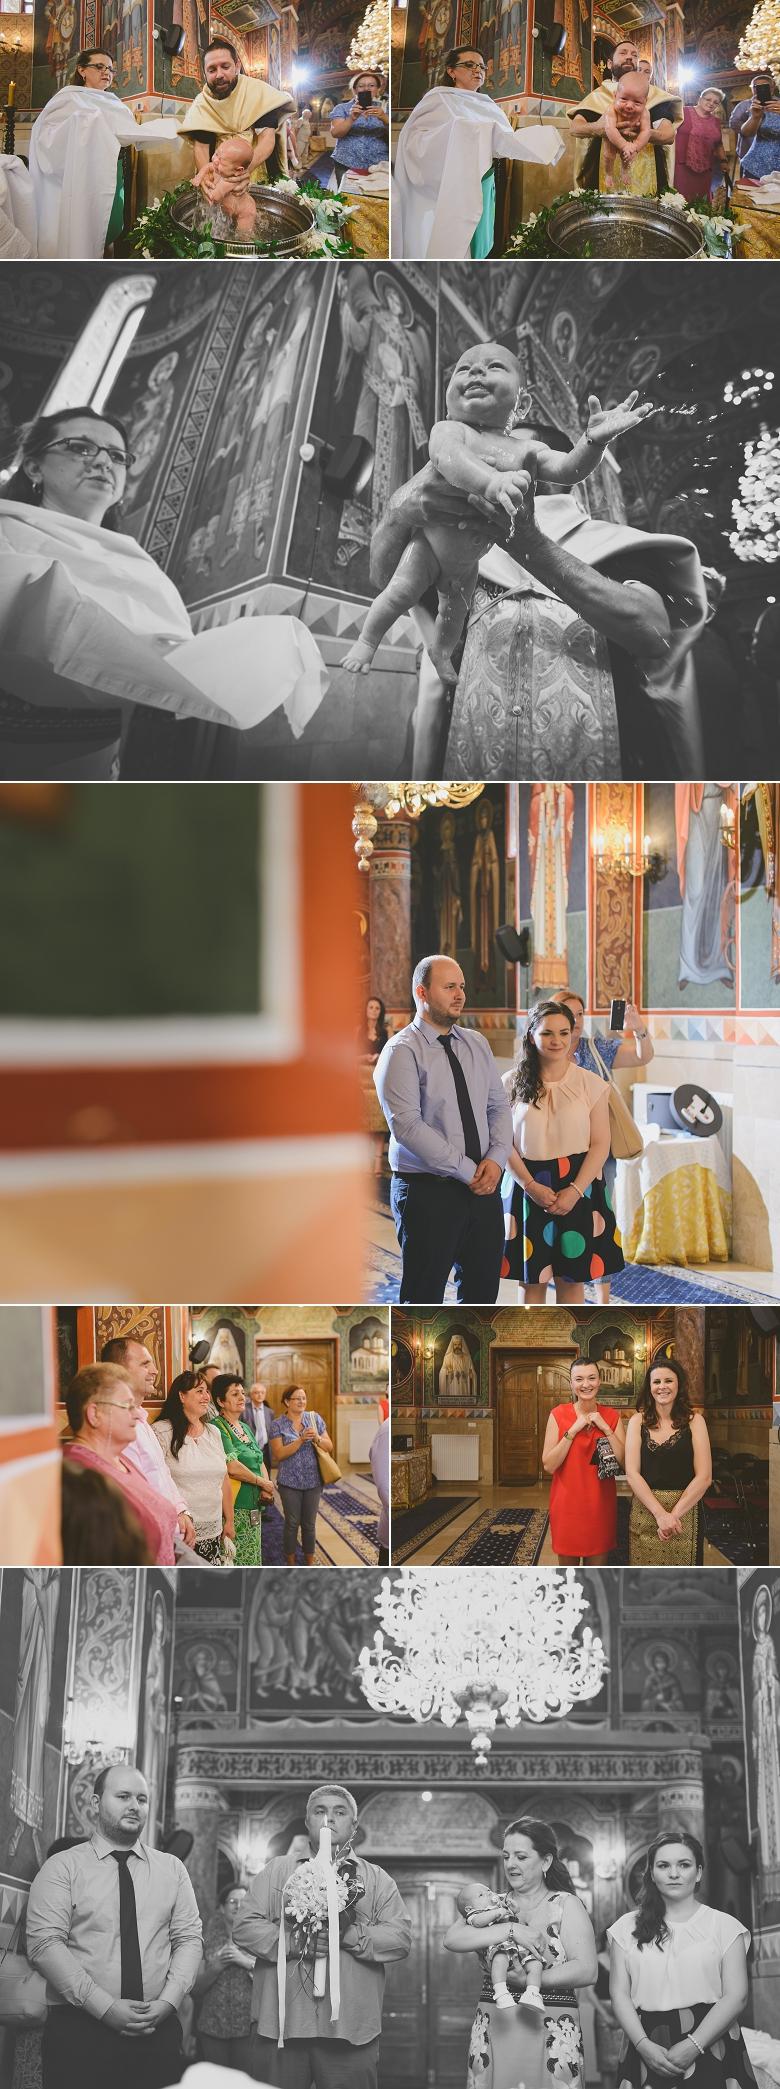 poze-botez-bucuresti-baia-mare-foto-video-botez-baia-mare 8